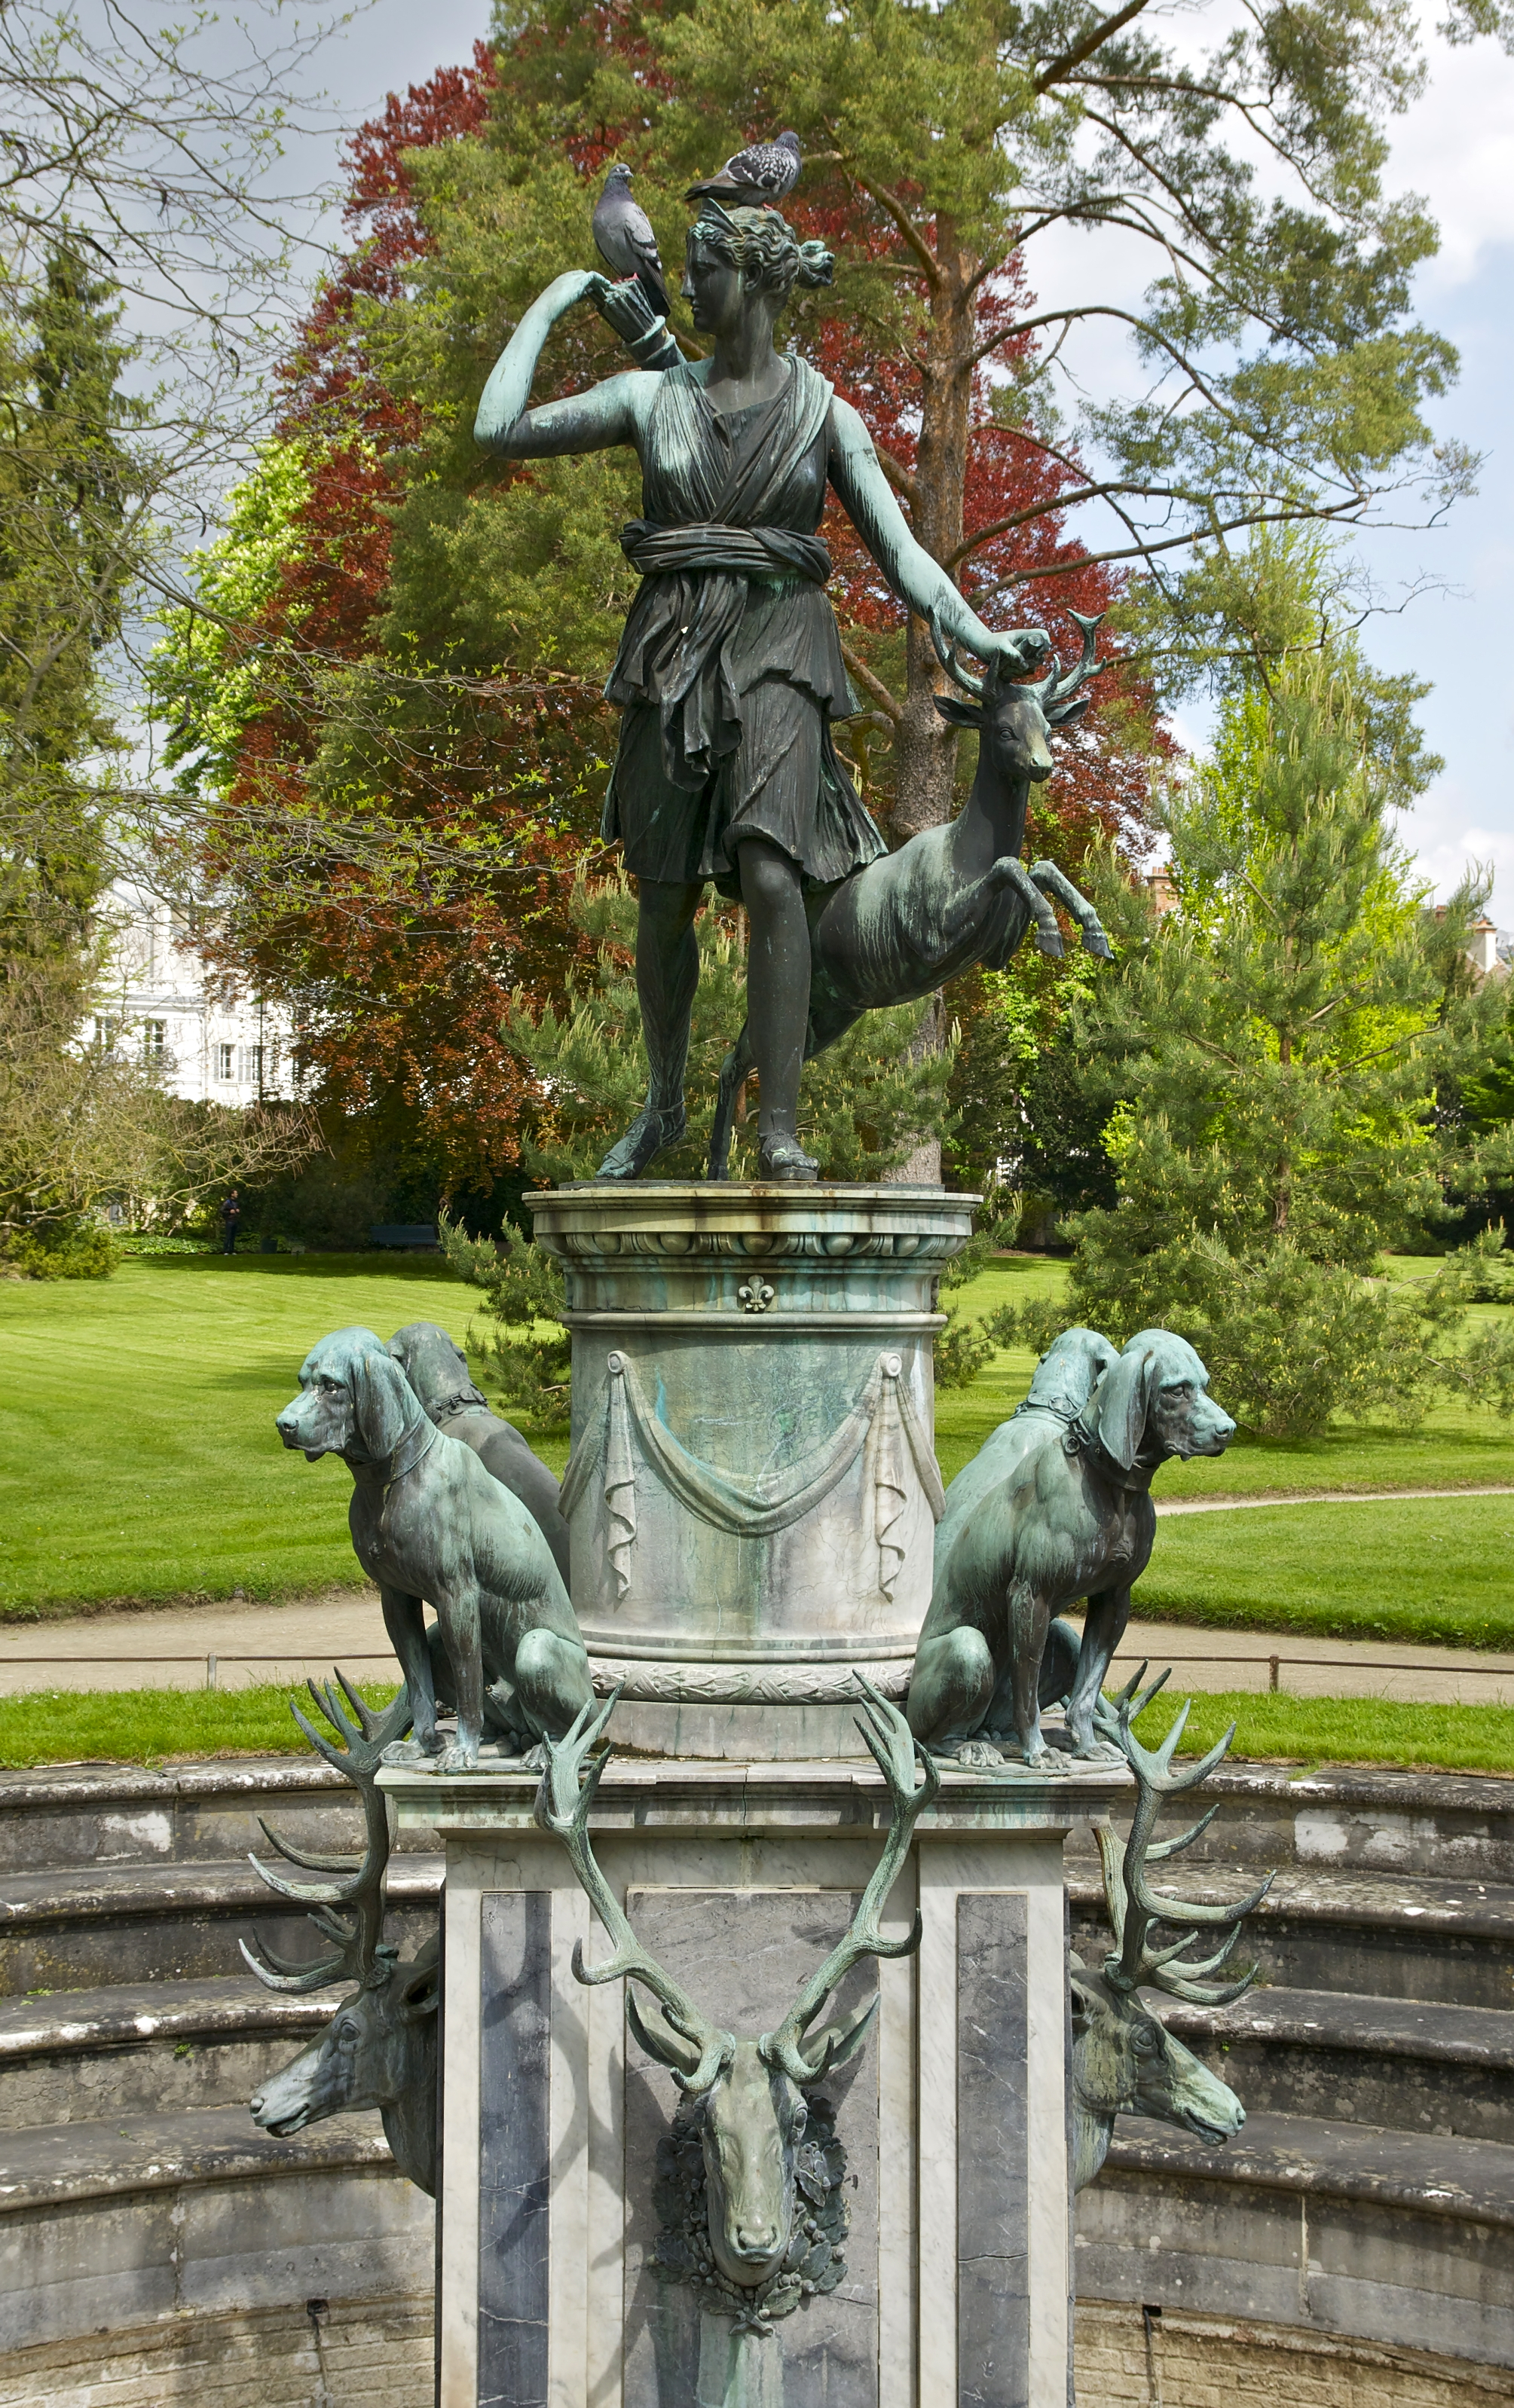 File:Fontaine jardin de Diane Fontainebleau.jpg - Wikimedia Commons